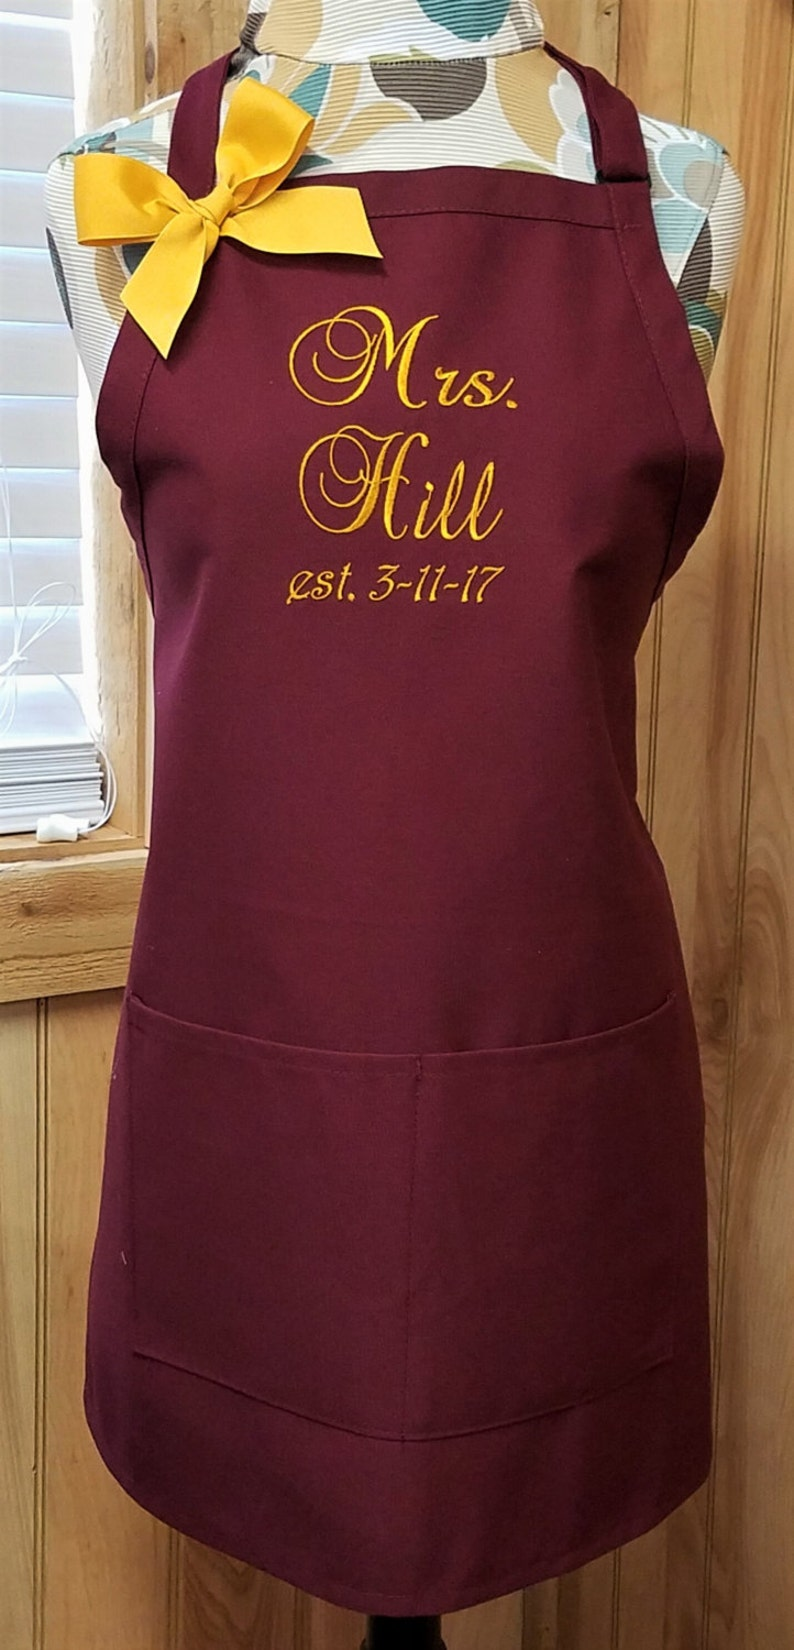 Bridal Shower Gift Kitchen Apron Womens Apron SALE ~ Personalized Apron Monogrammed Apron